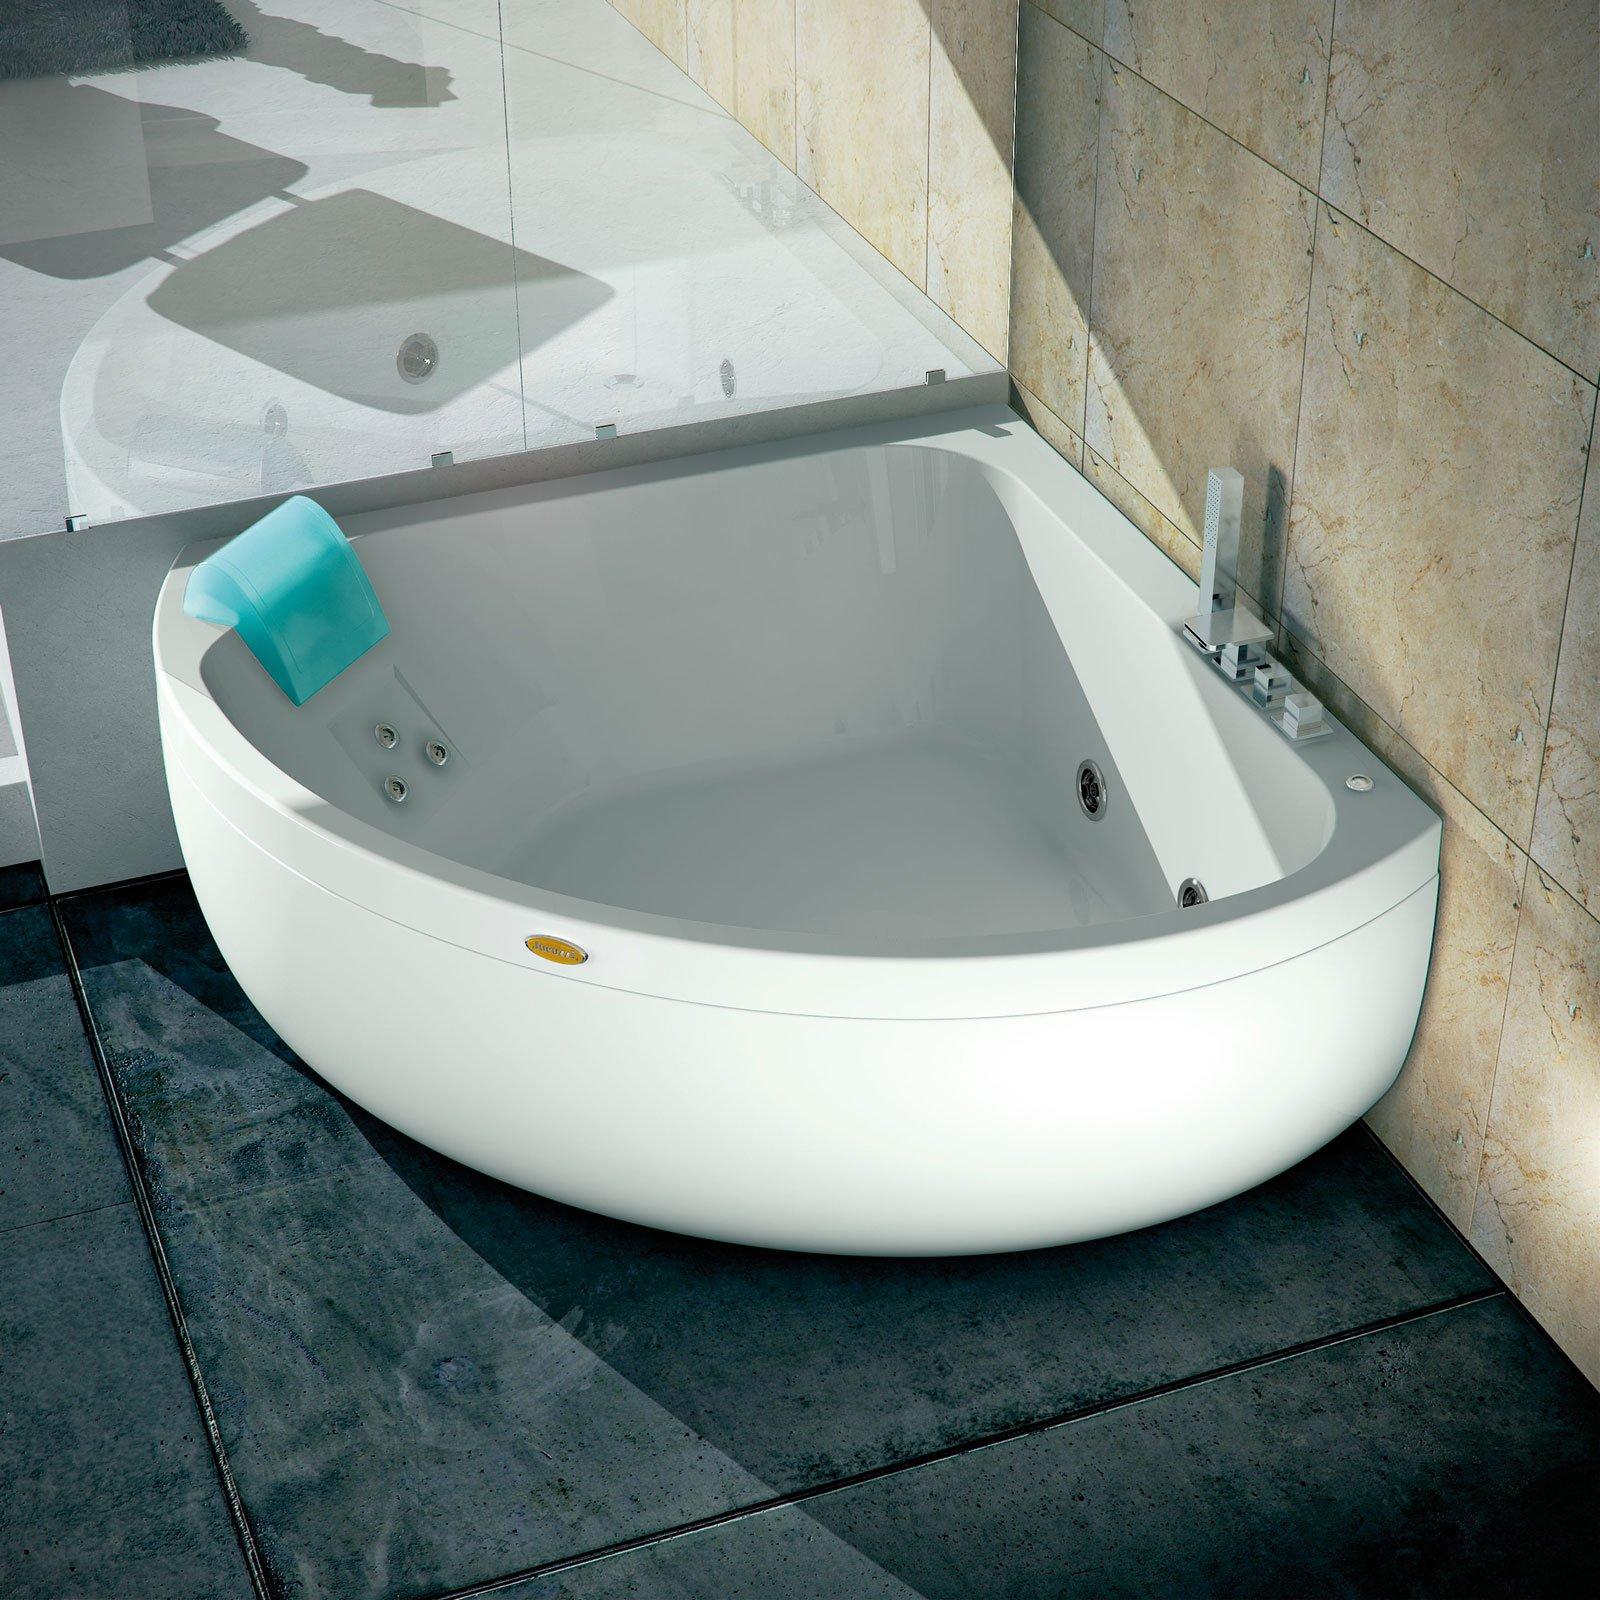 Vasche da bagno in acrilico leggere e antiscivolo hanno - Ladybird vasca da bagno ...